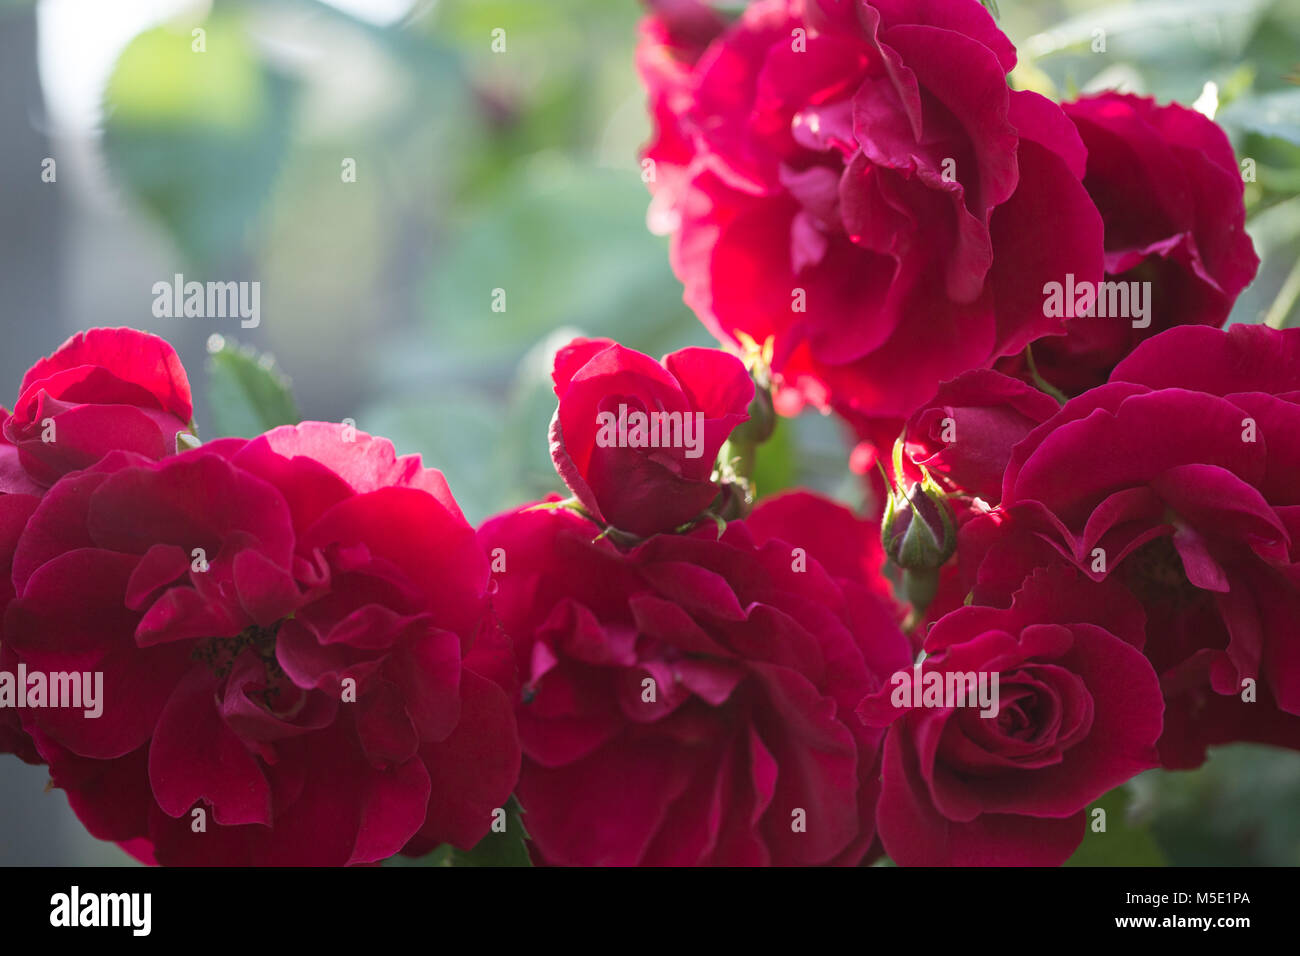 Romance Petal Romantic Valentine Plant Love Beautiful Beauty